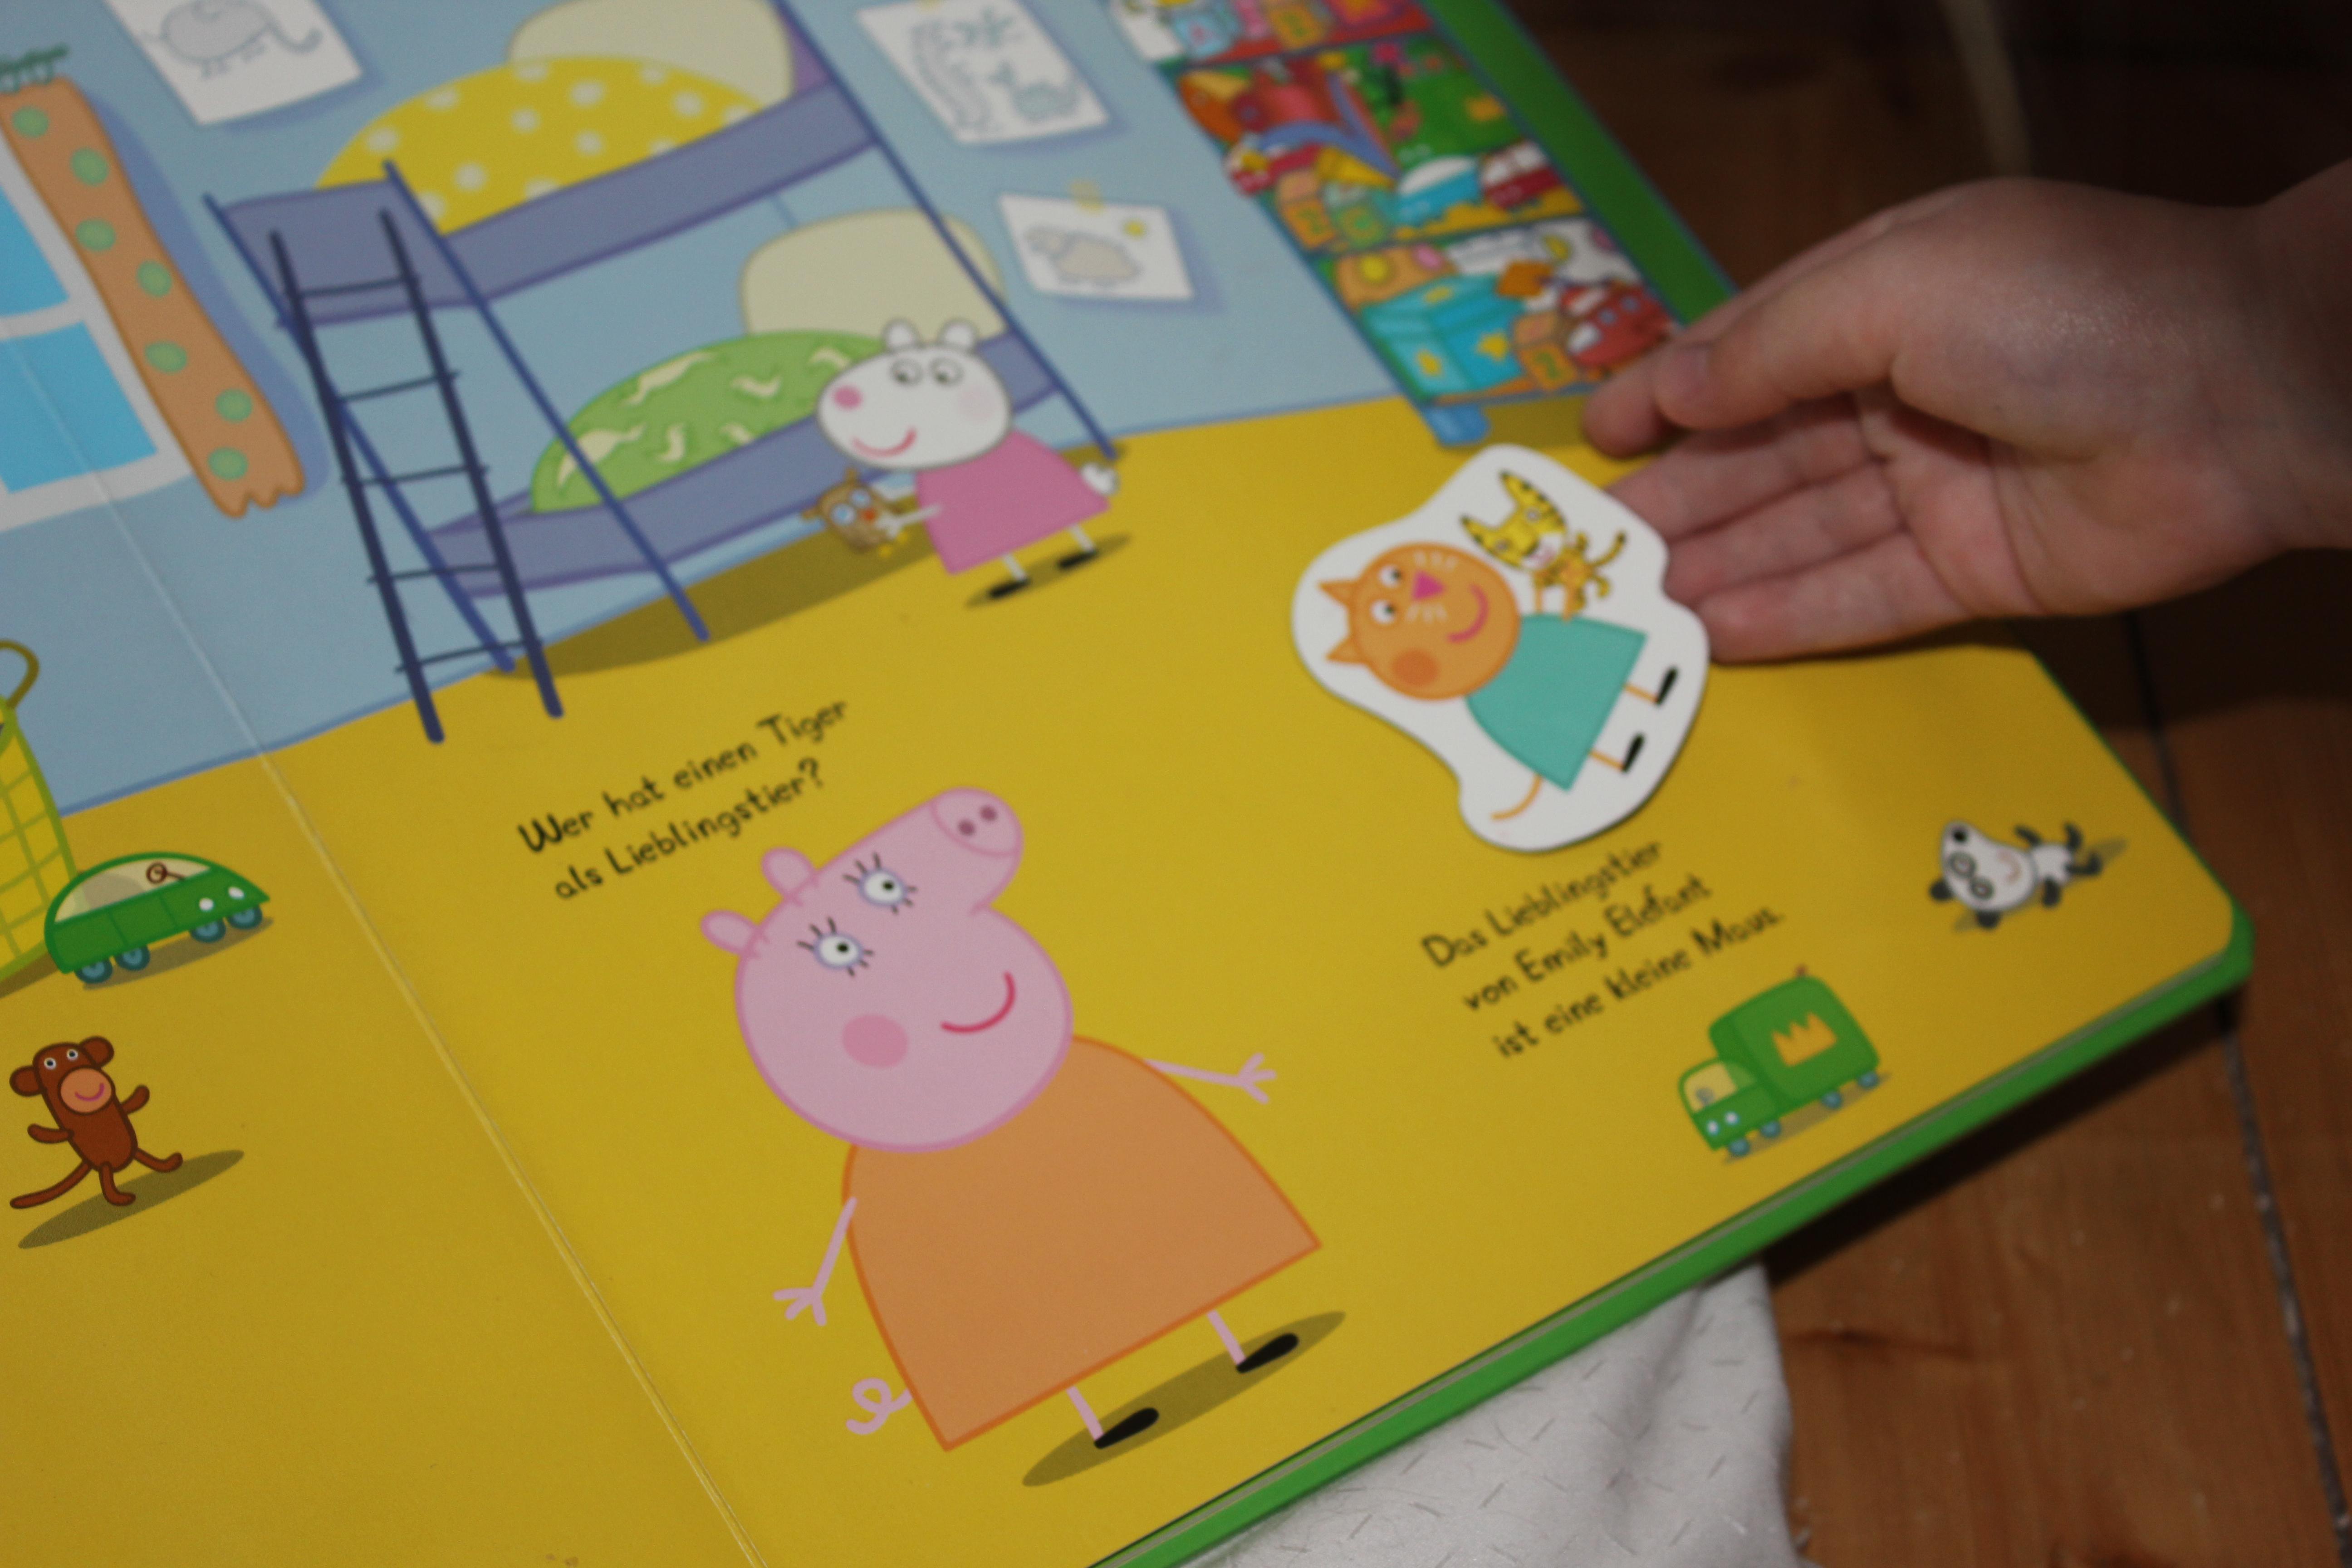 Kind legt Molly Mieze in das Peppa Wutz Buch